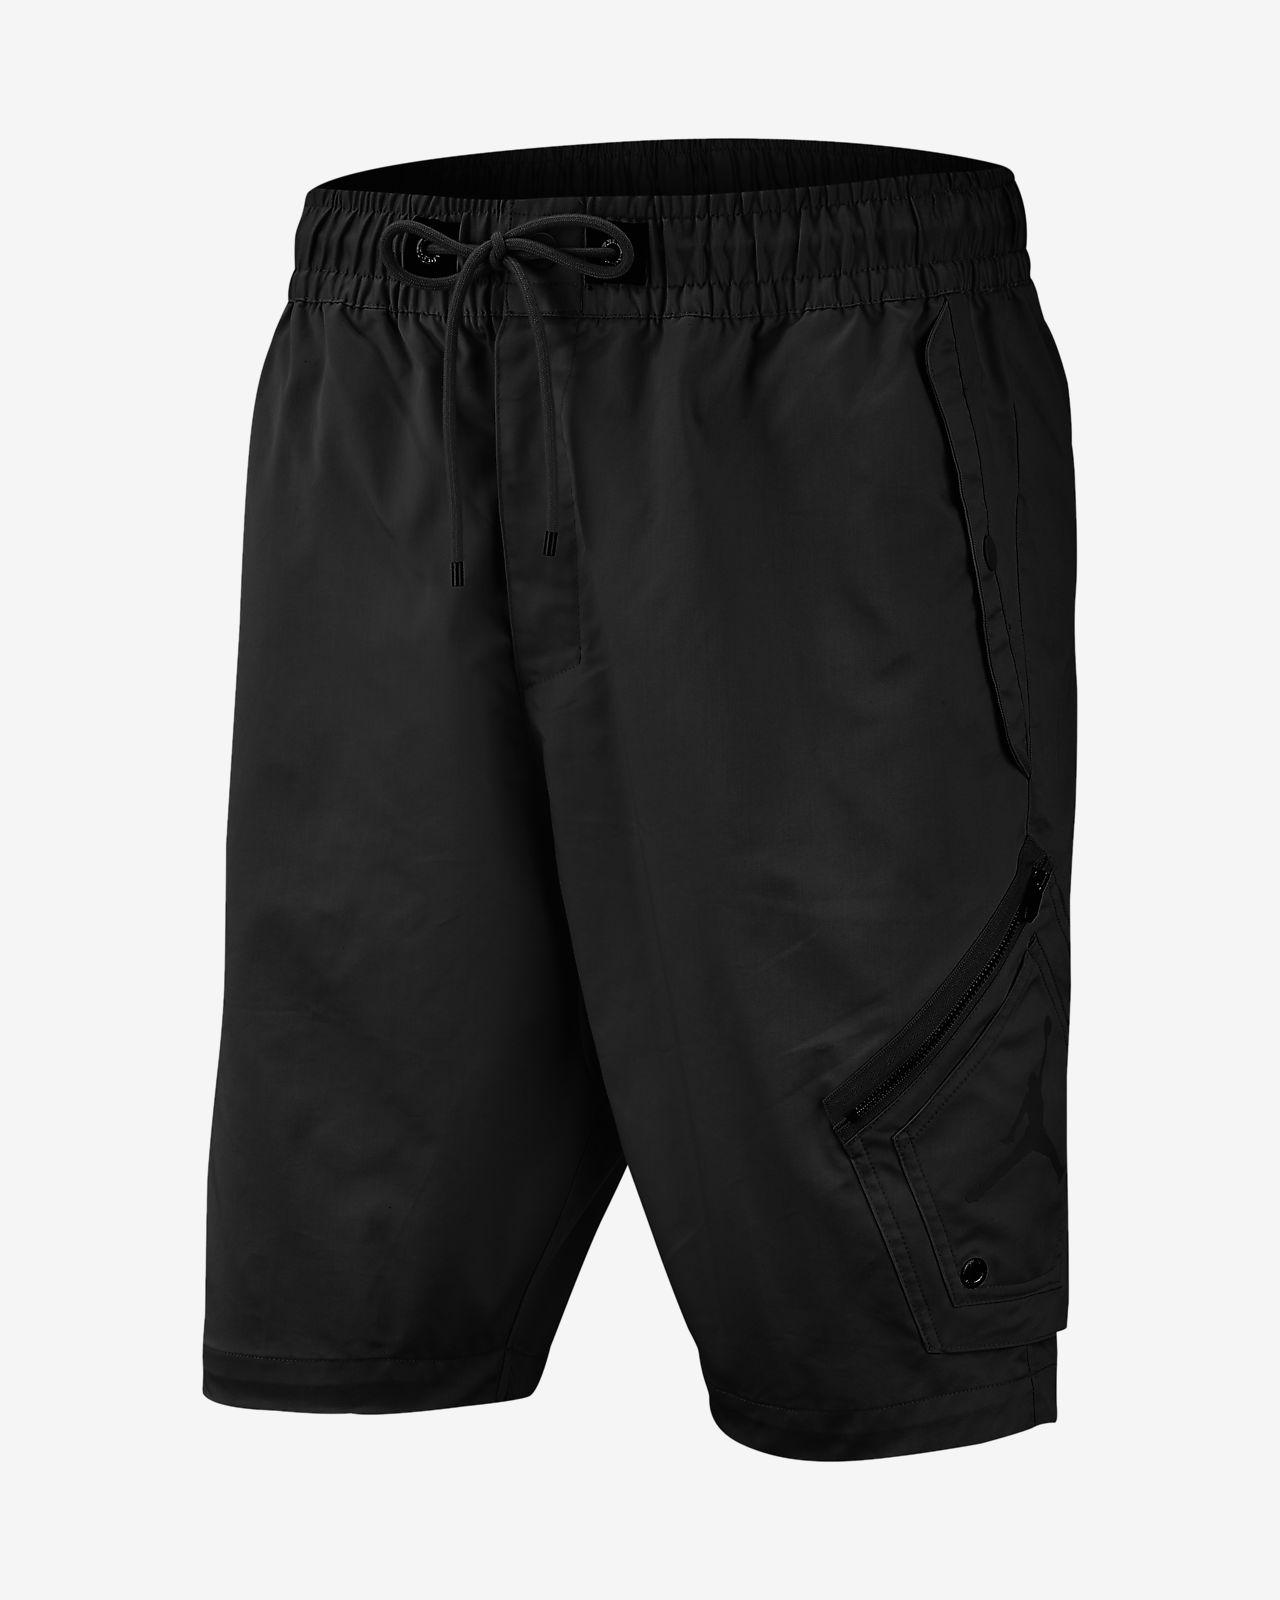 Jordan Wings Pocket Men's Woven Shorts